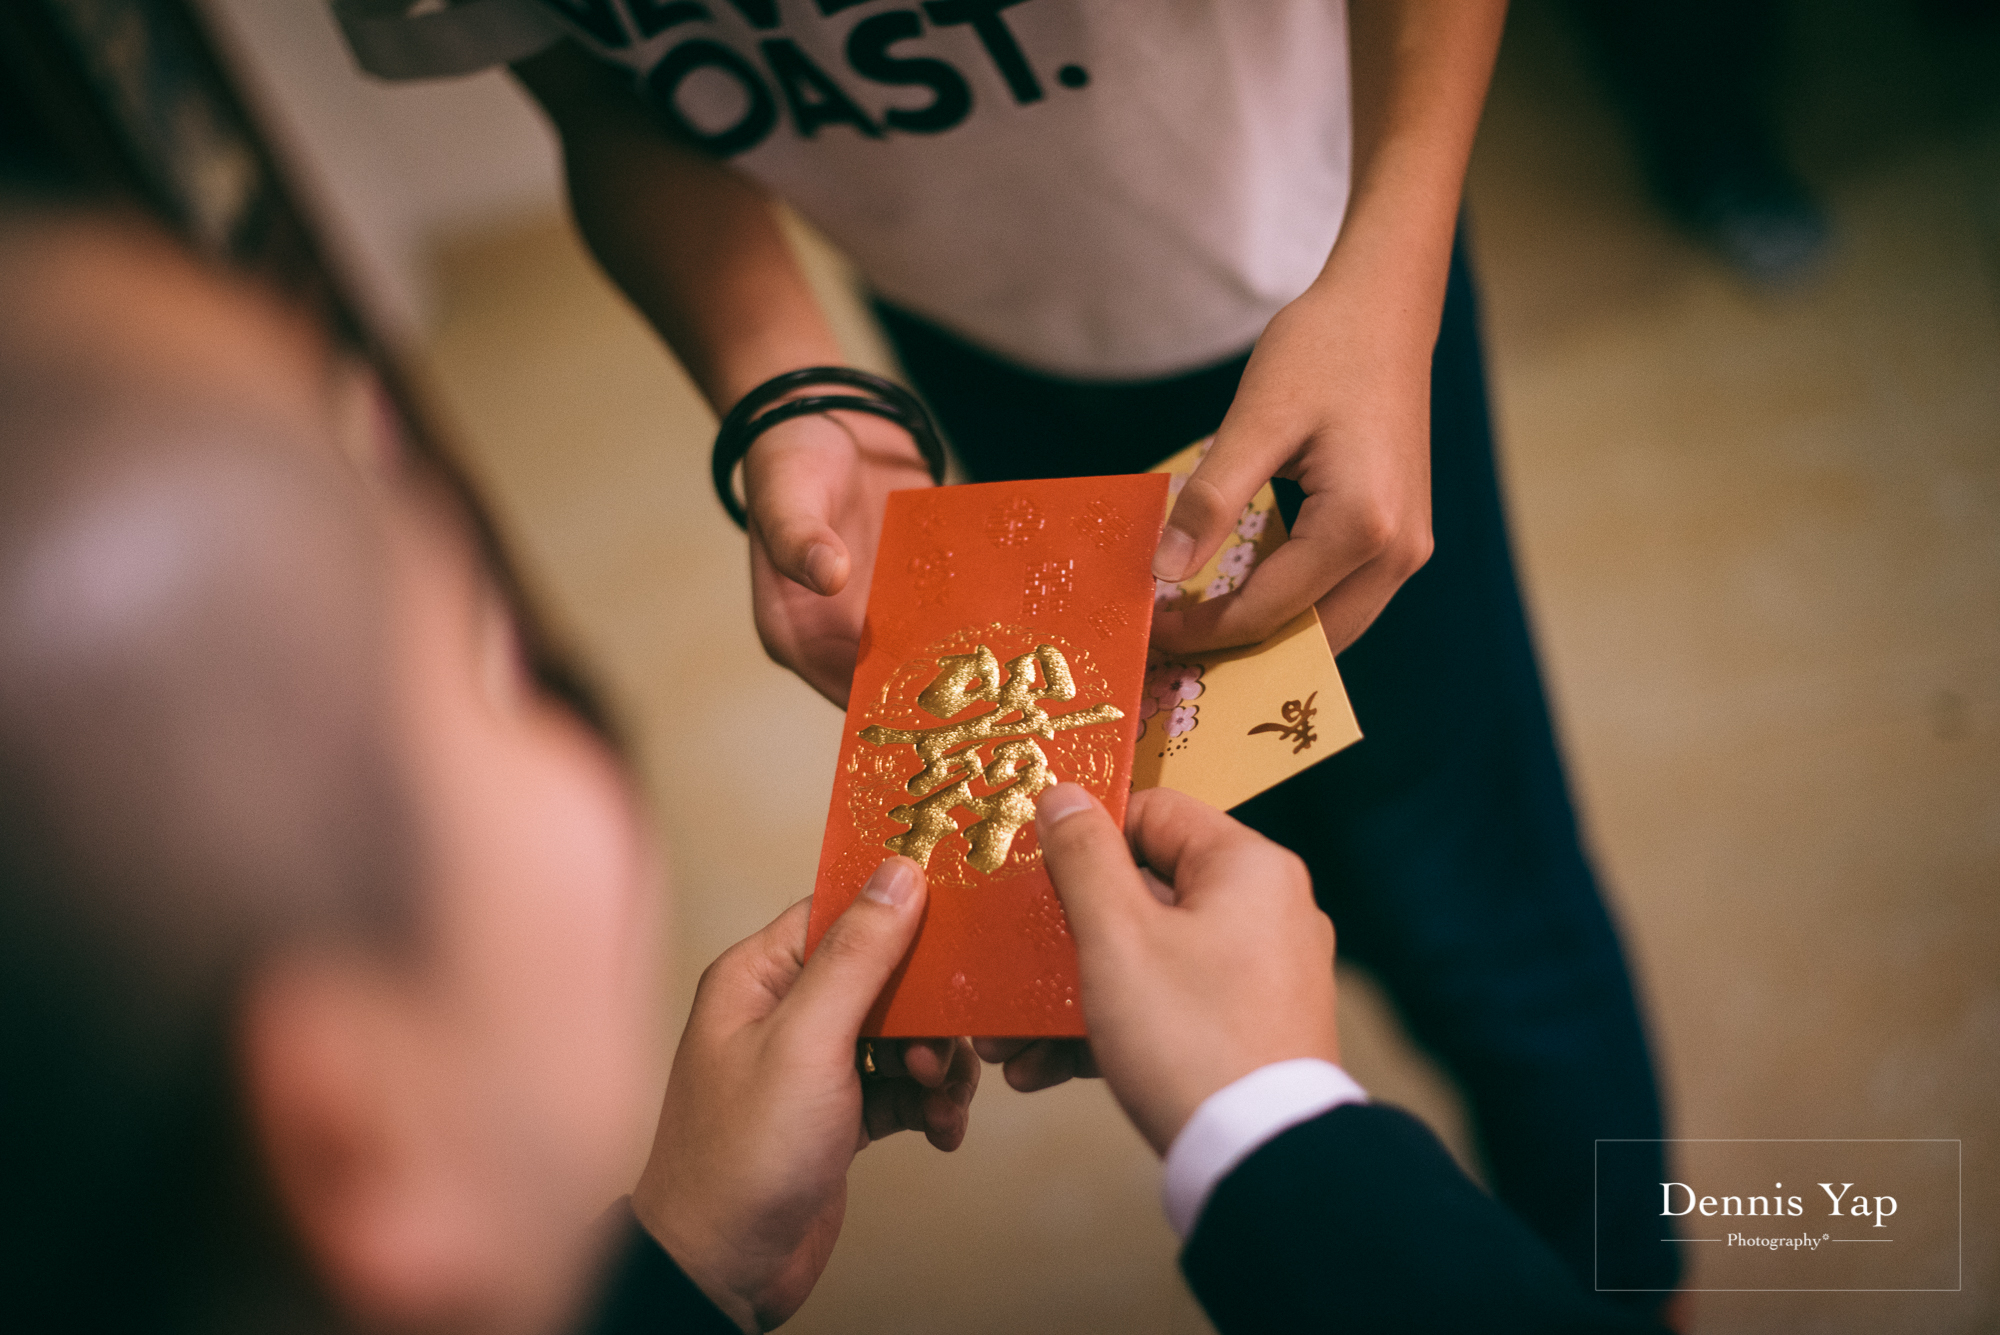 we chard sharon wedding day gate crash majestic hotel kuala lumpur moonlight dennis yap photography malaysia-23.jpg